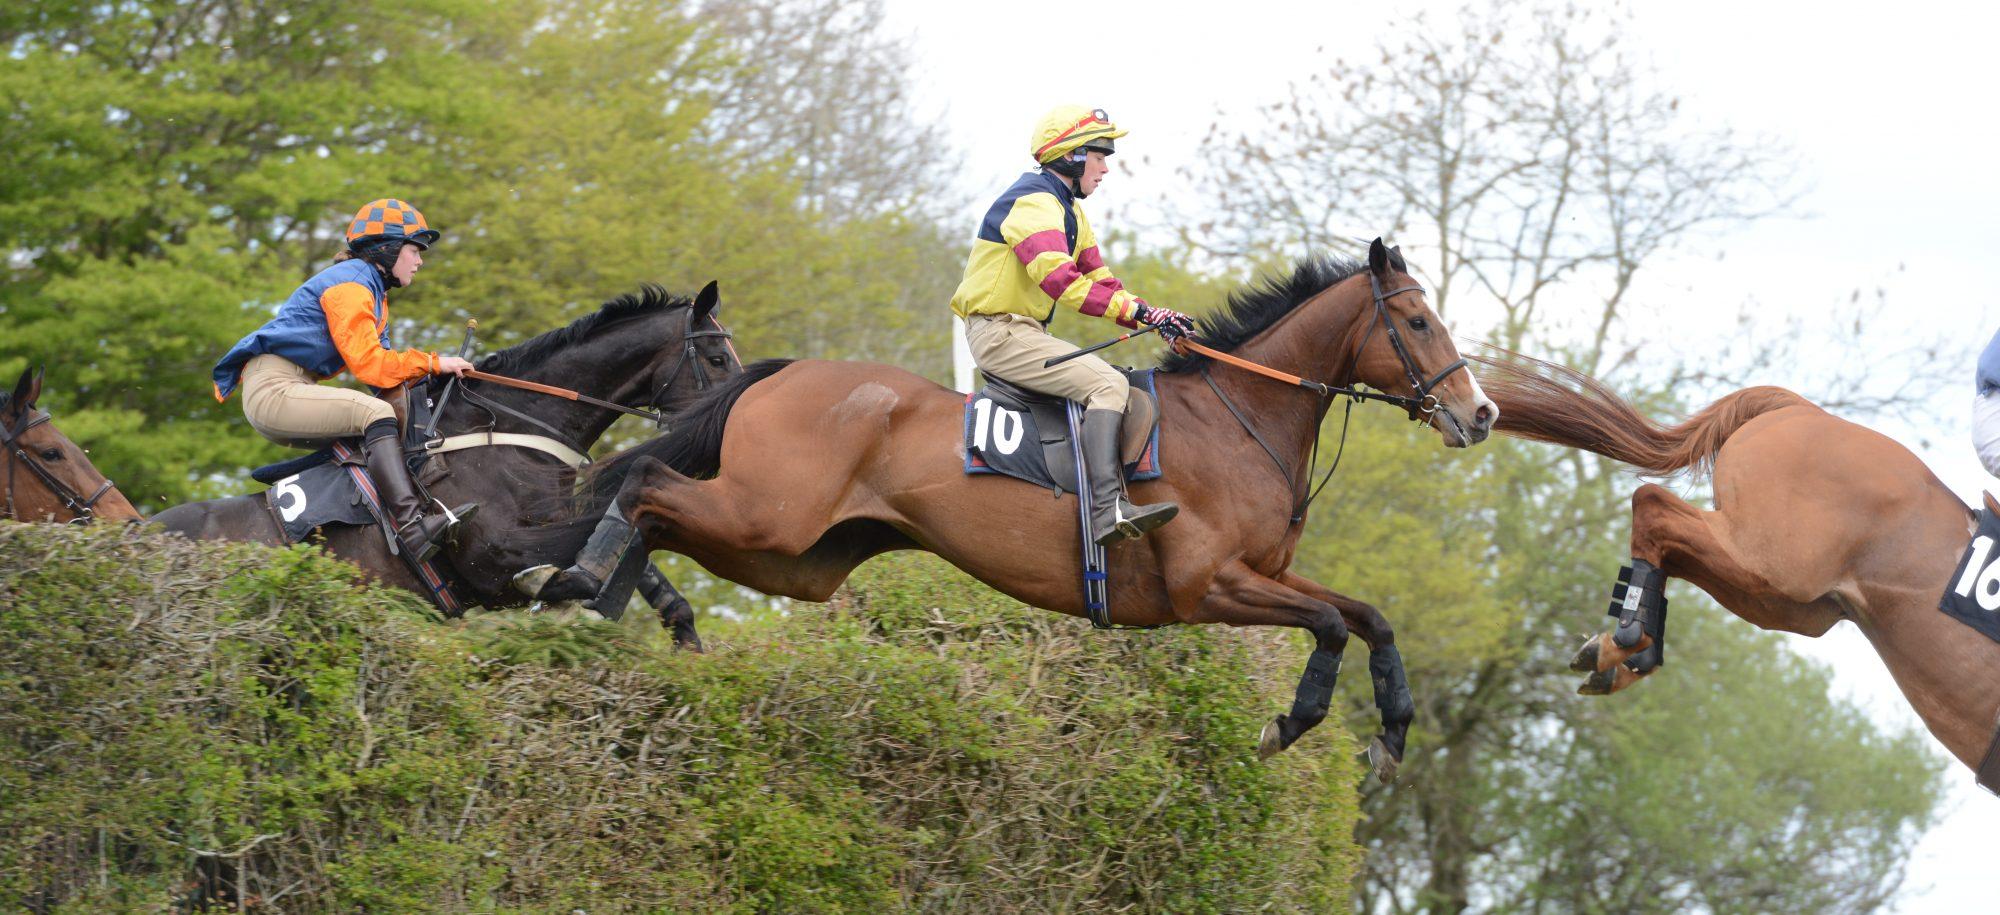 ESRM Equestrian Events